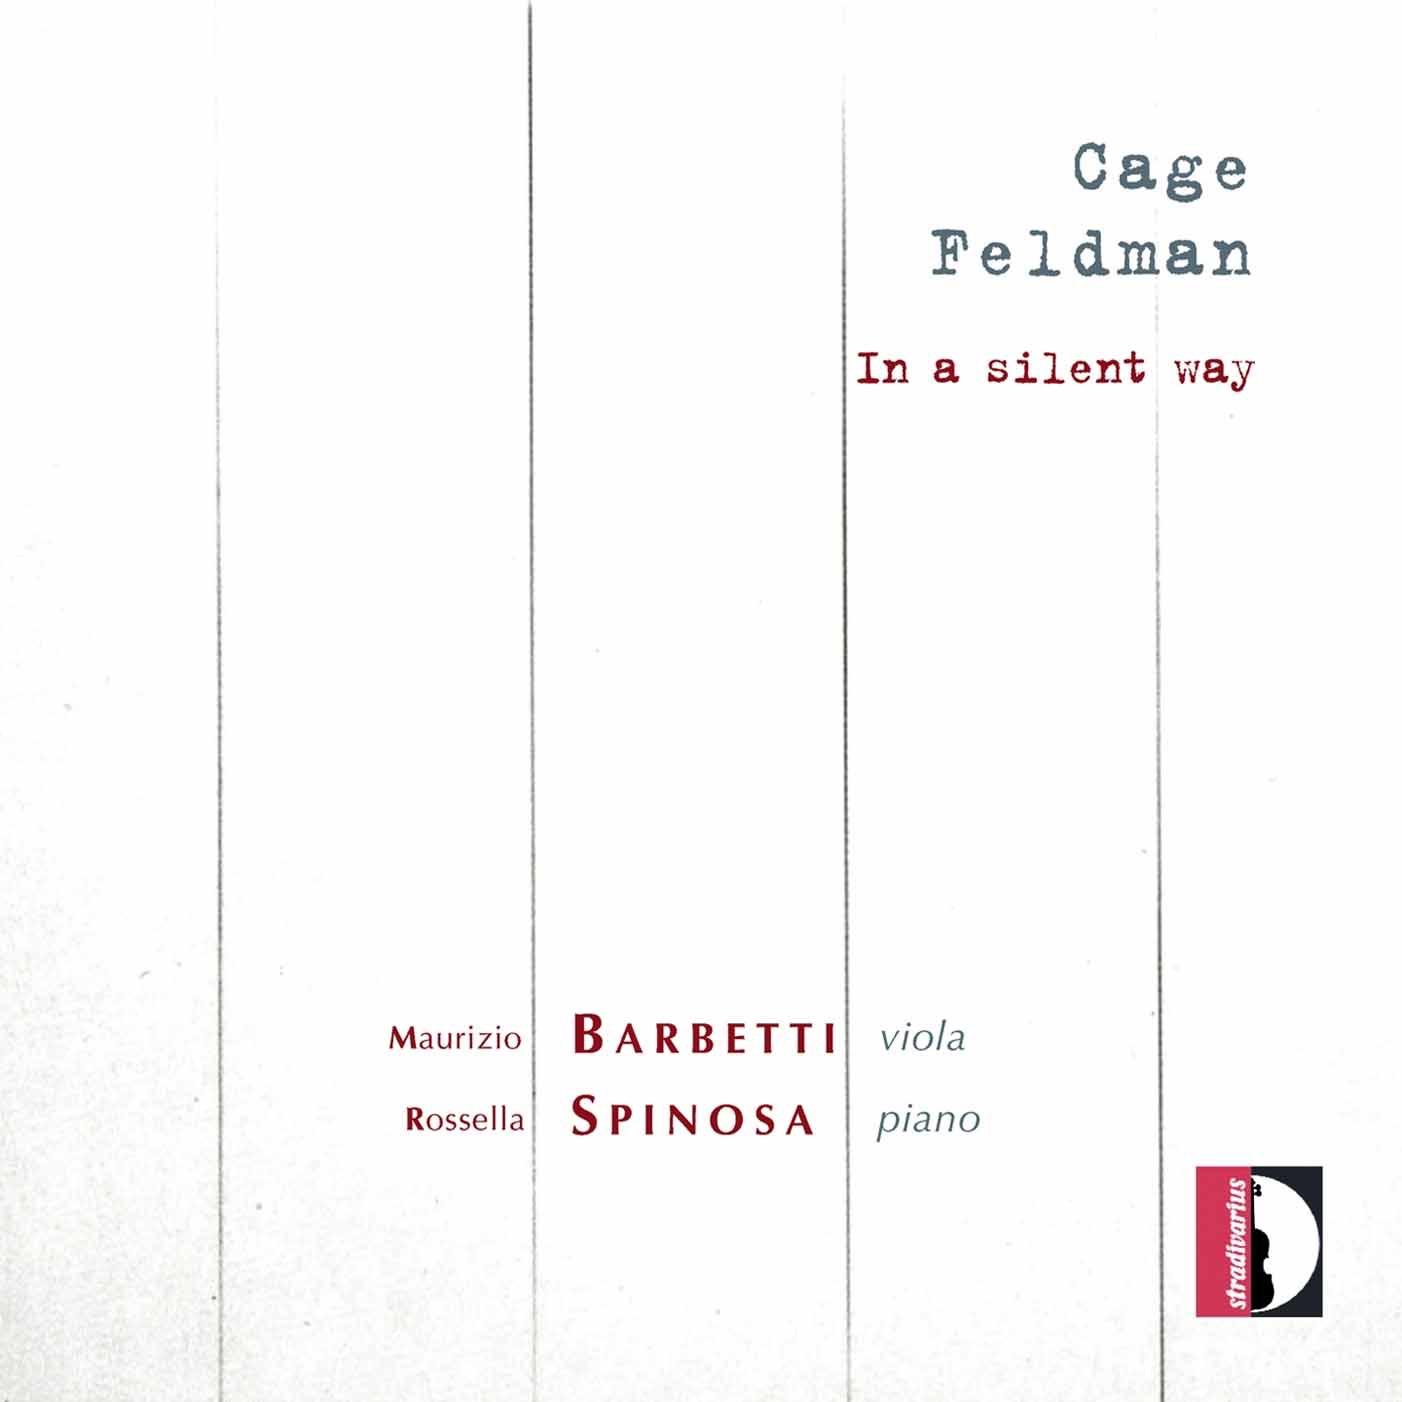 Cage & Feldman: in a Silent Way